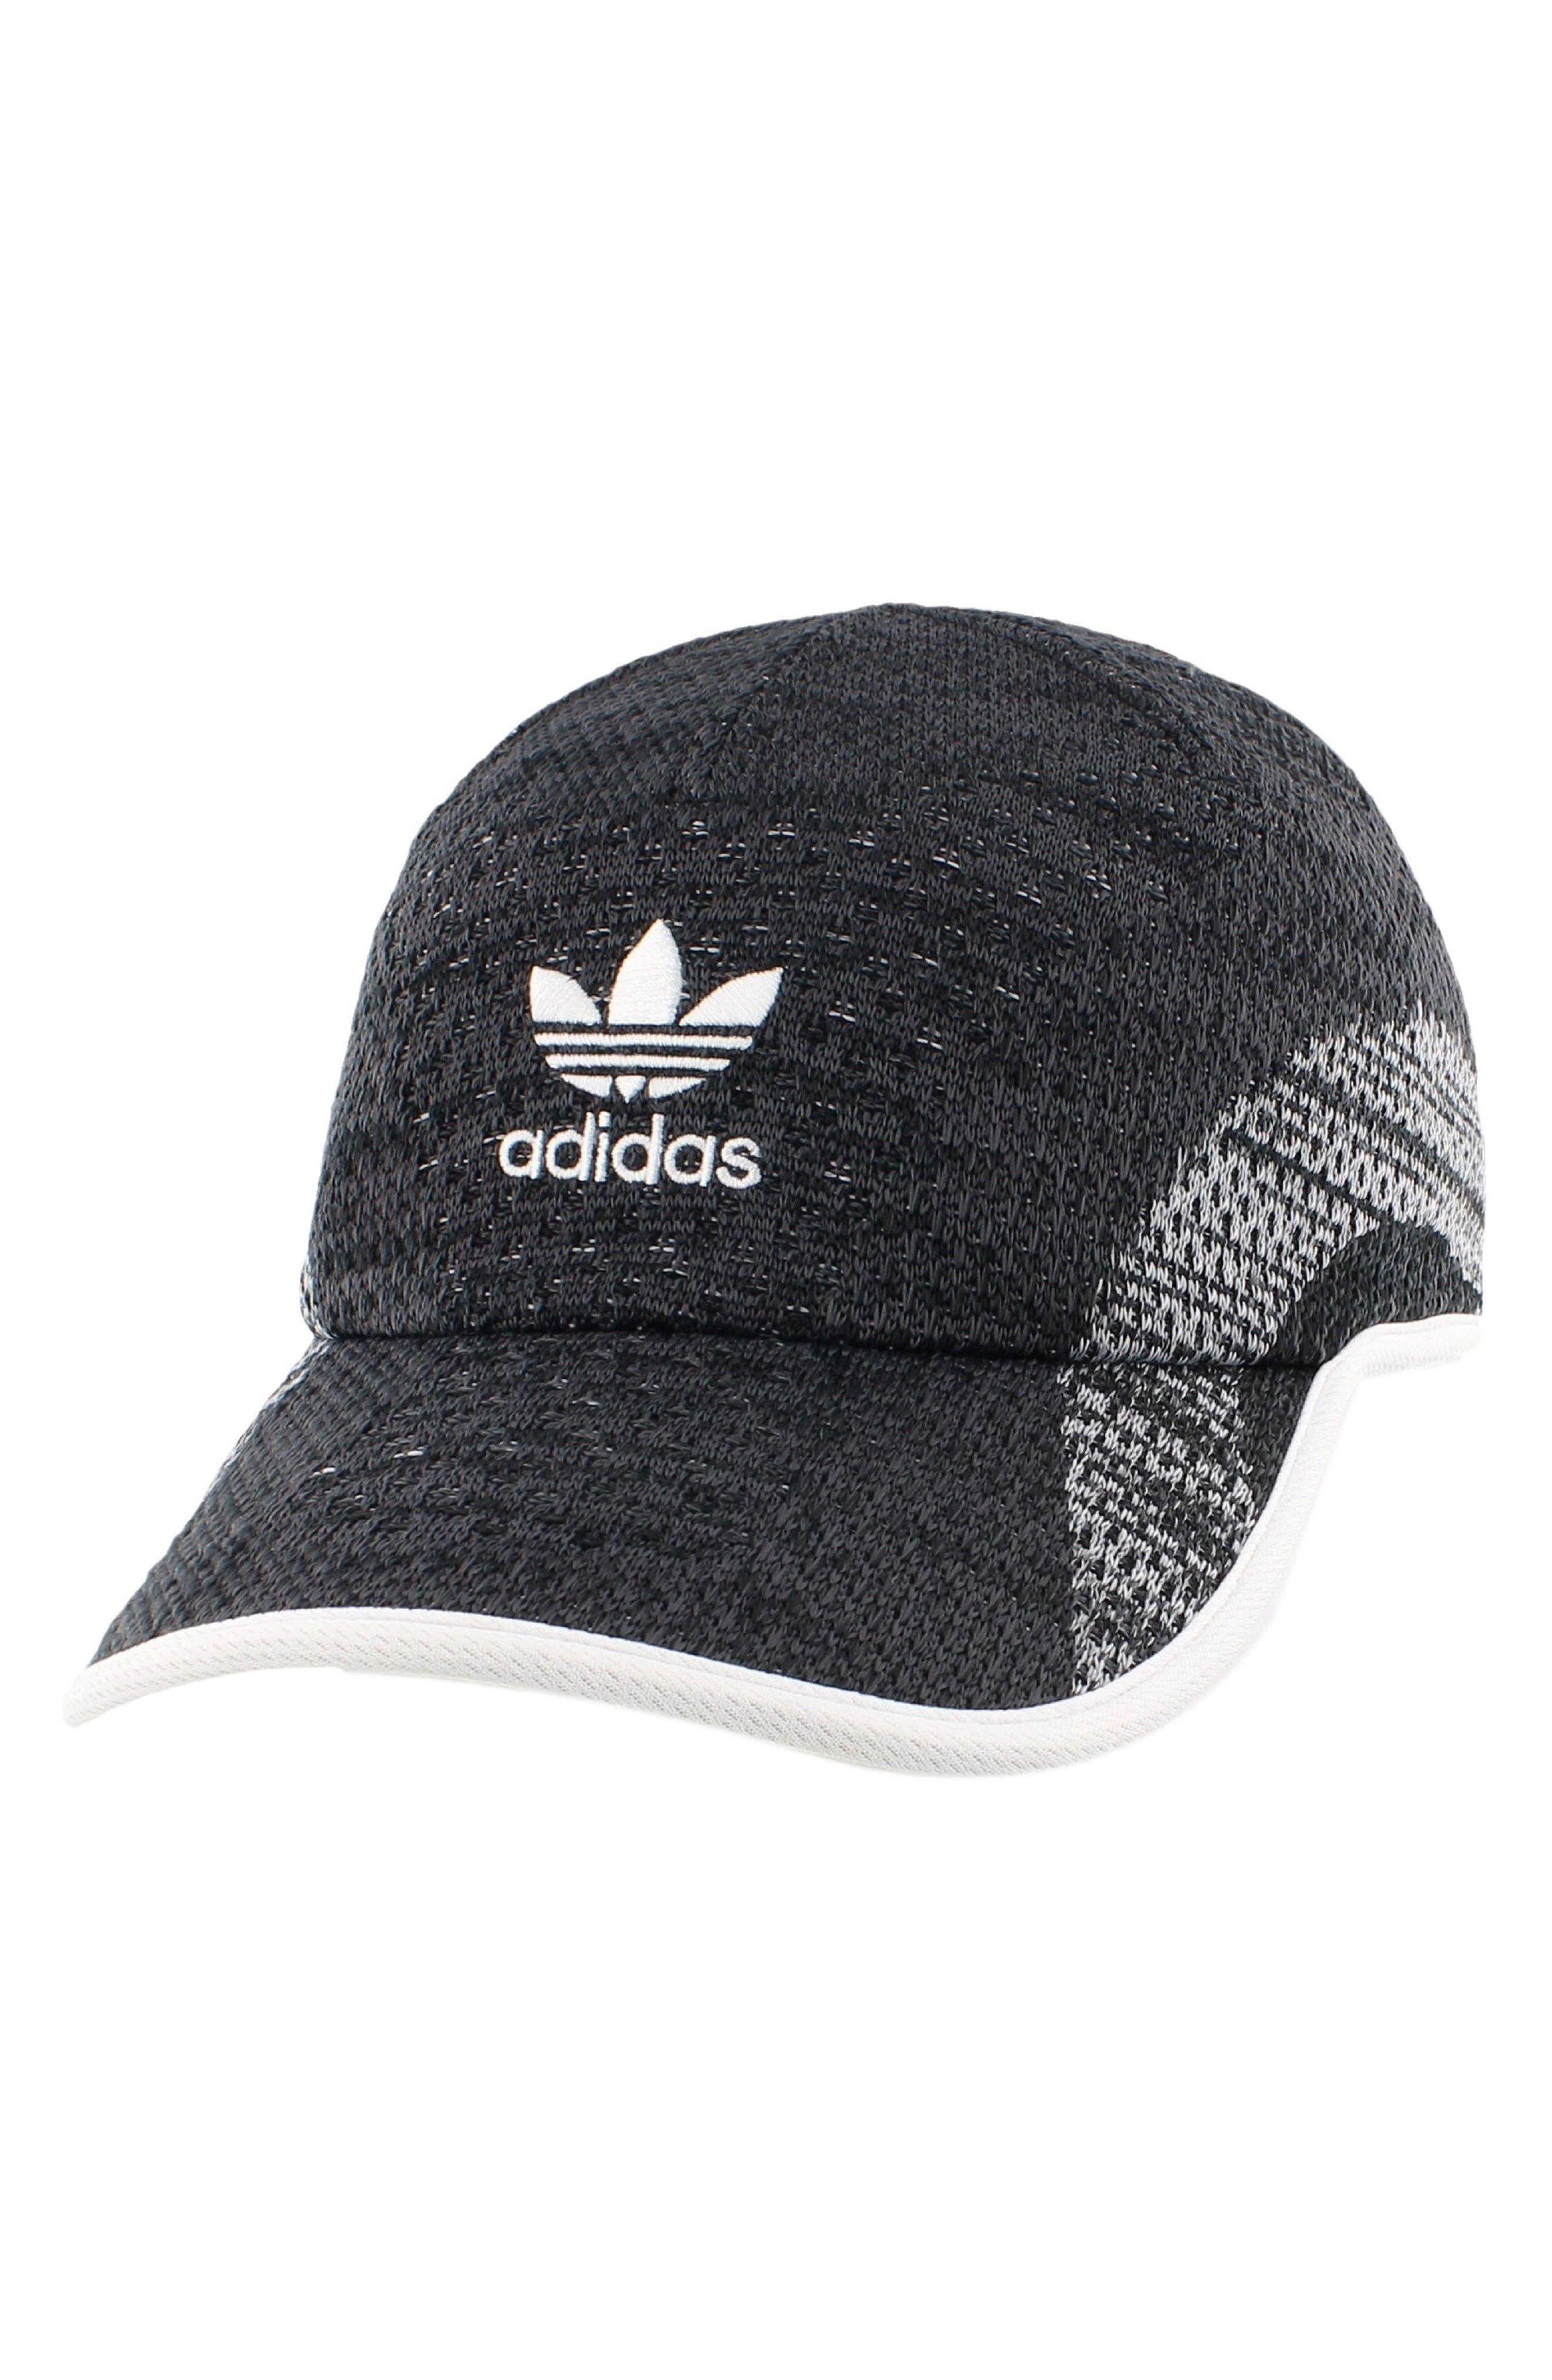 Primeknit Ball Cap,                         Main,                         color, 001